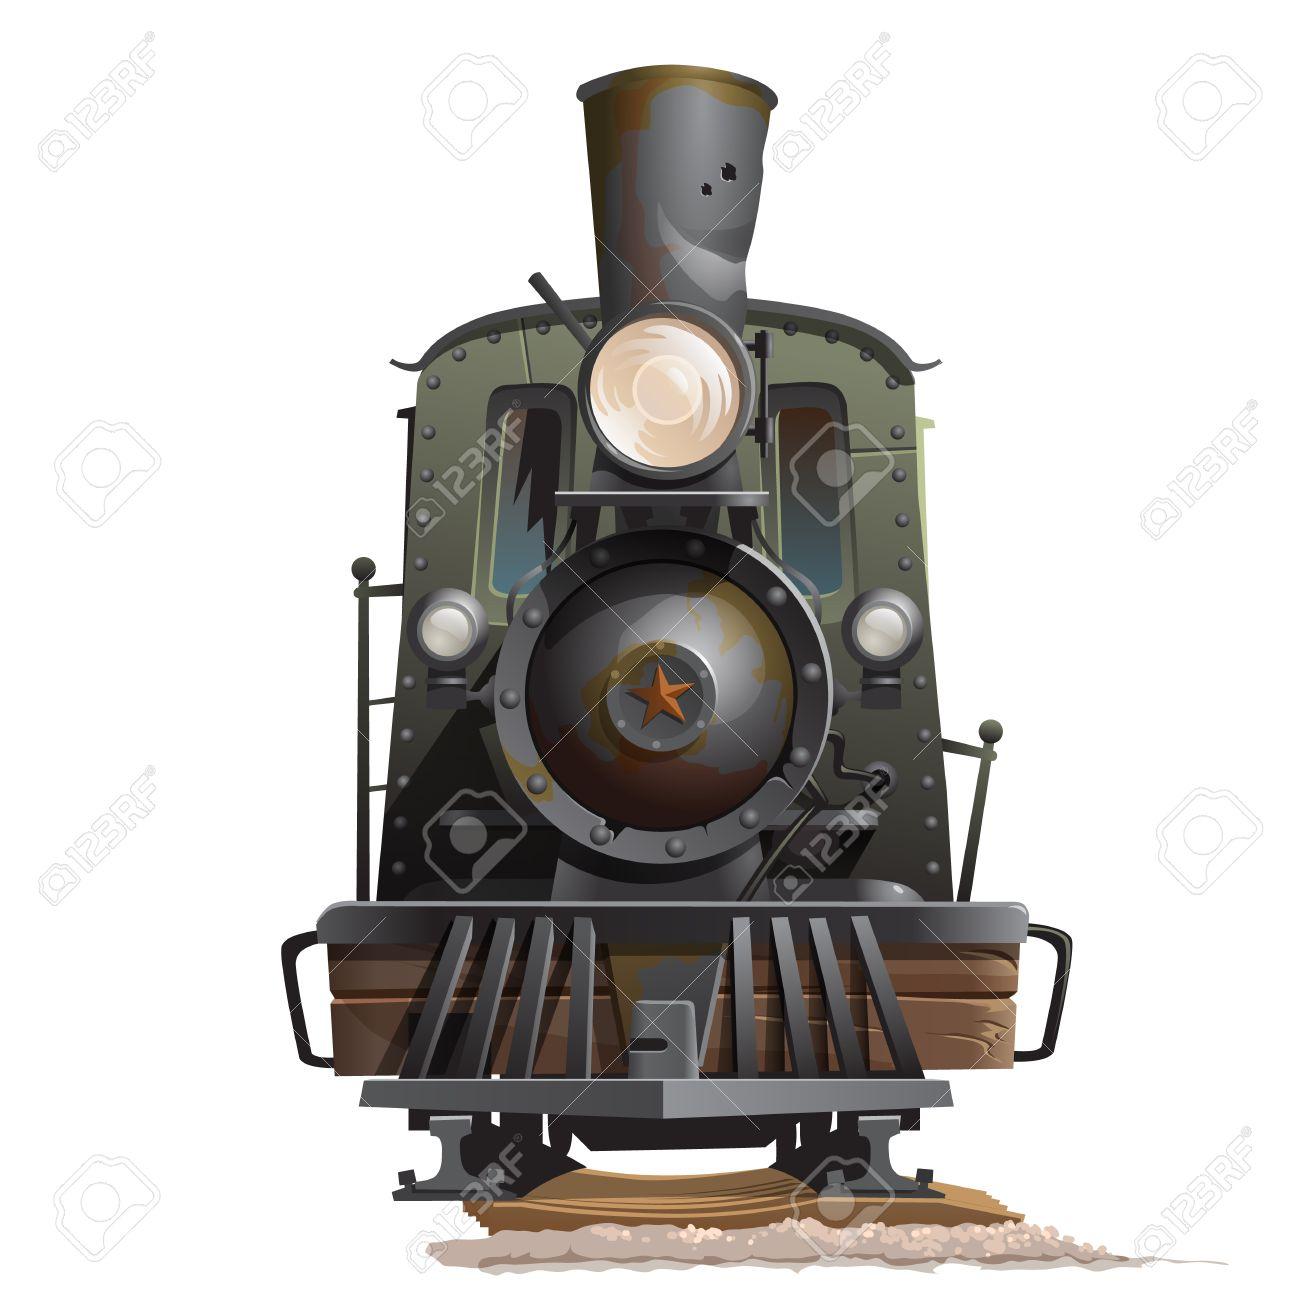 Old train locomotive, front view. Vintage transport vector - 58852974